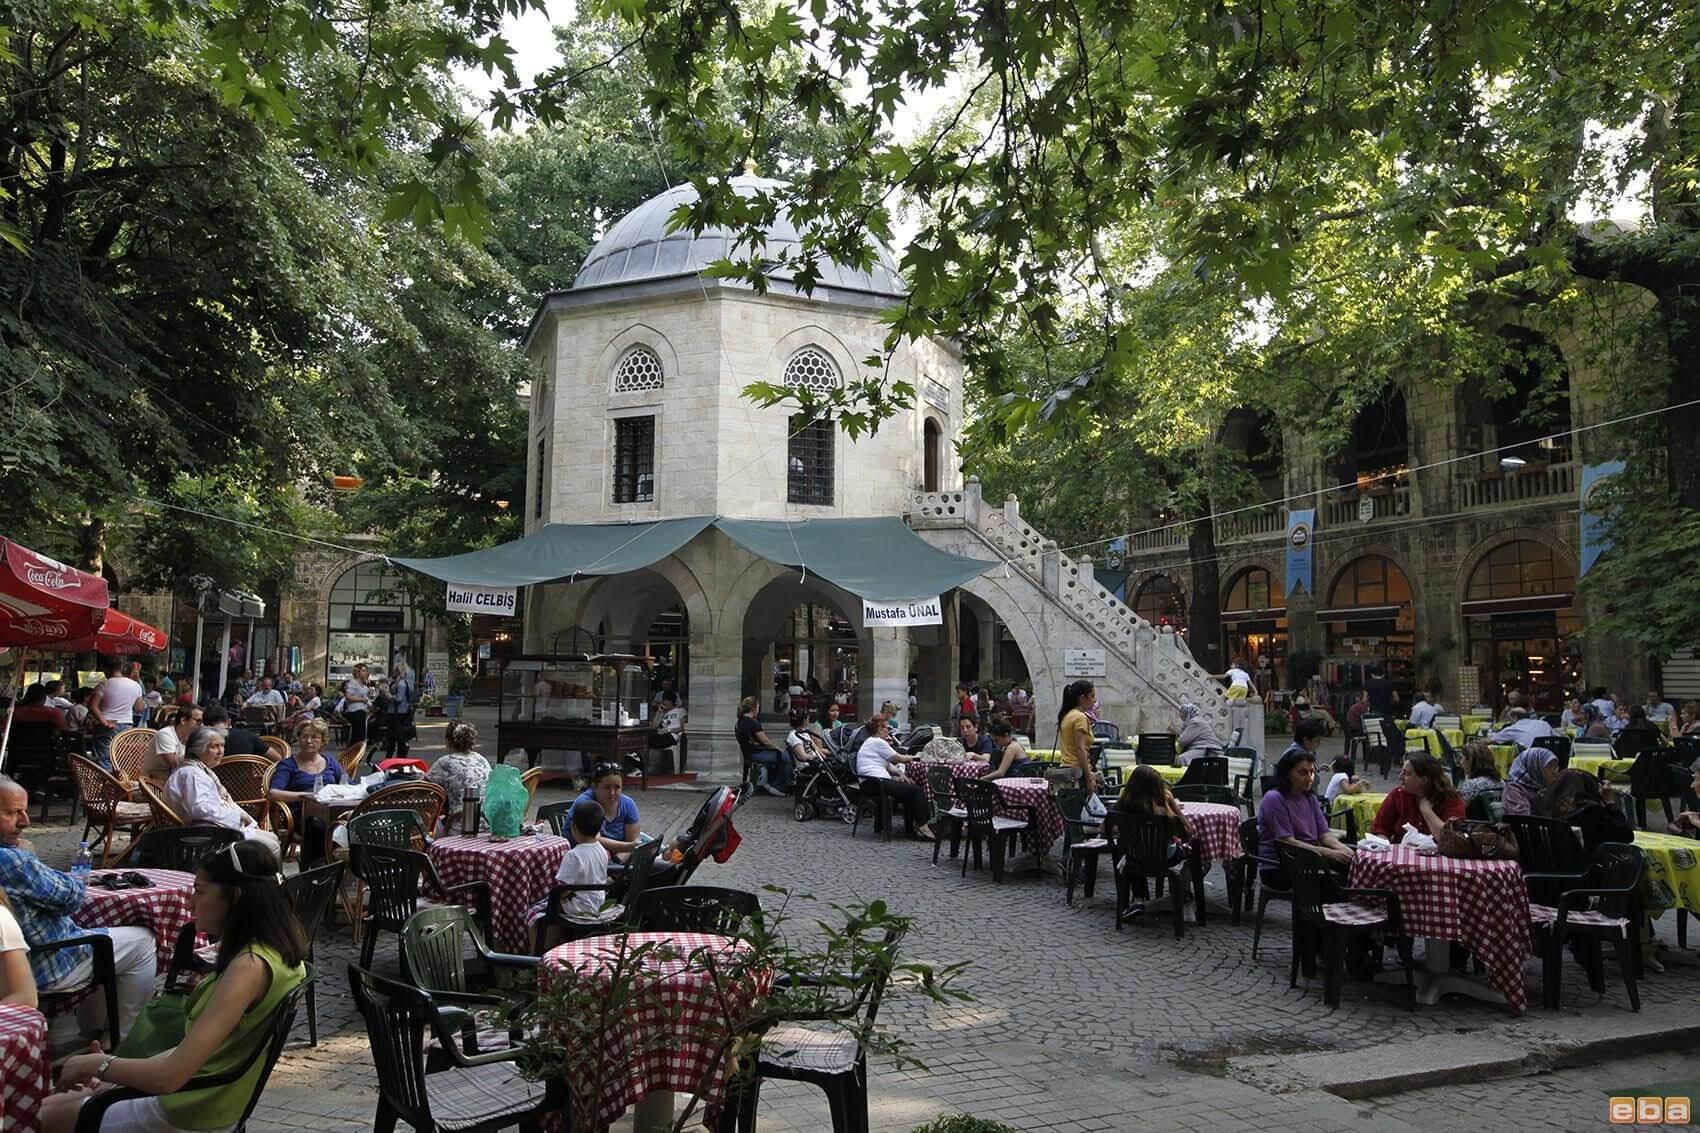 كوزا هان اسطنبول